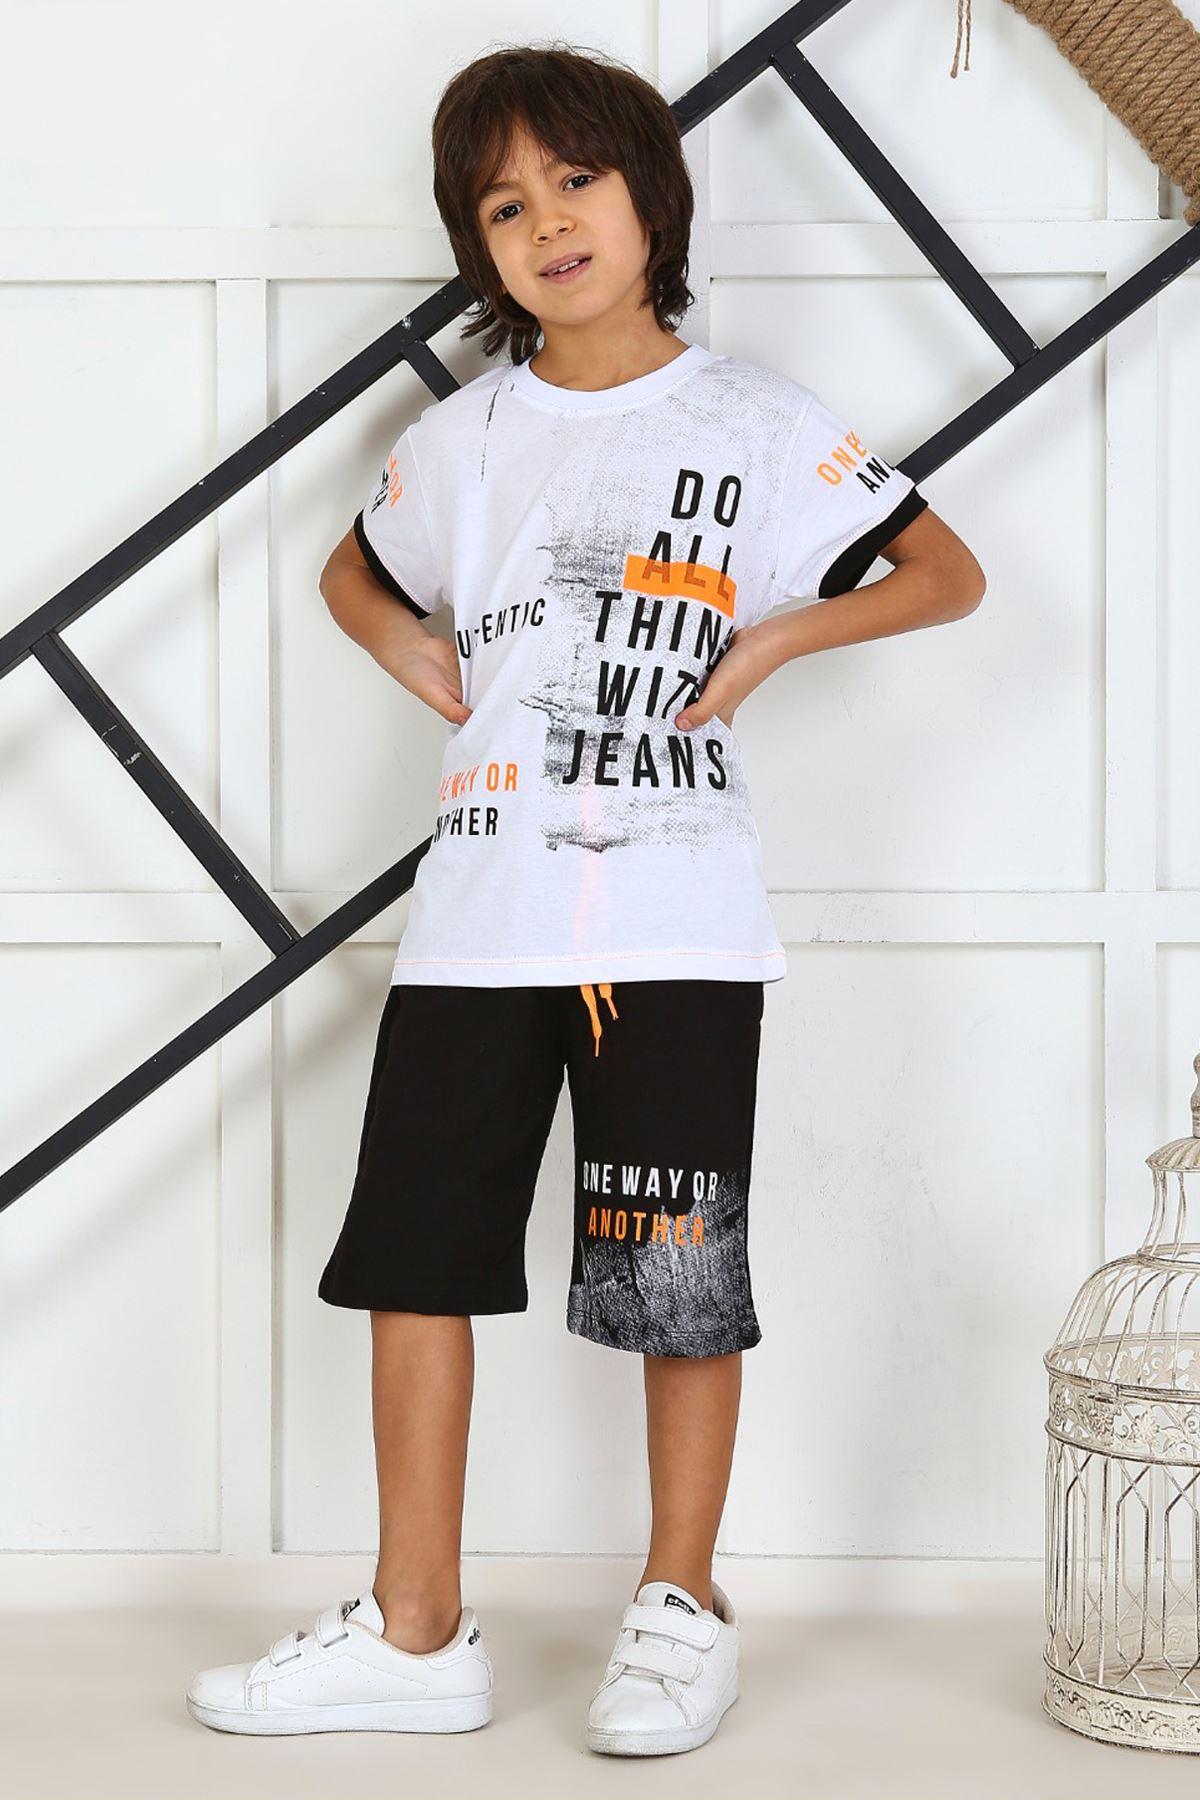 White Boy 'S Child Summer Capri Set 2 Pieces Male Clothes Capri T-shirt Casual Holiday Boys Kids Cotton Outfits children Clothing